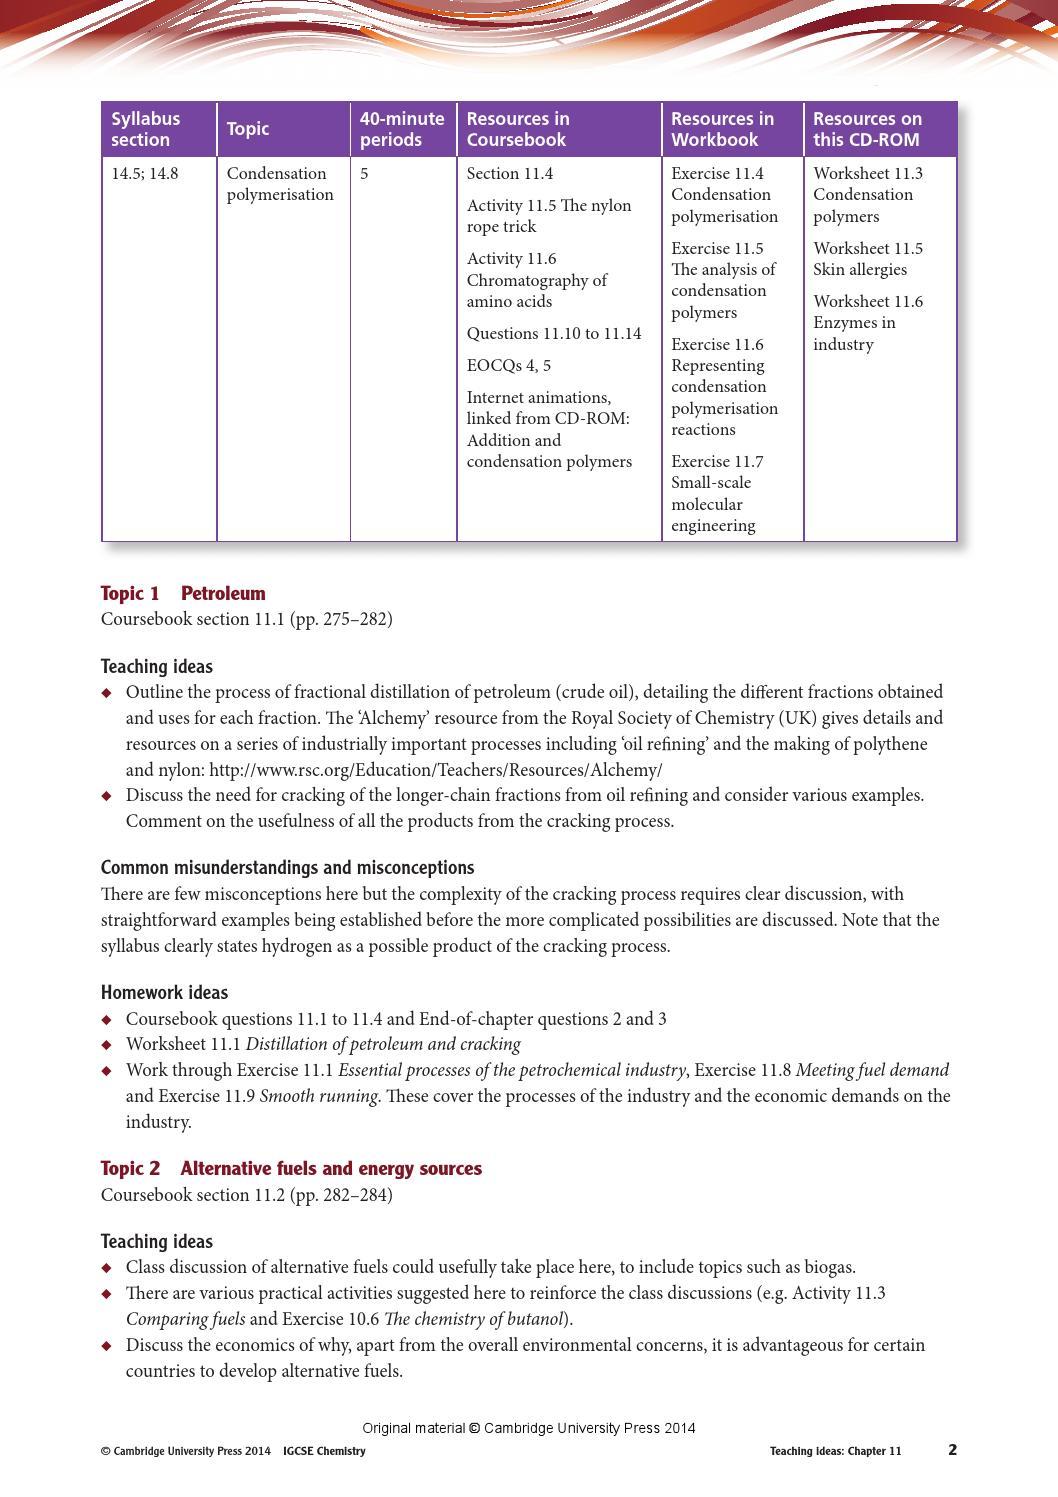 hight resolution of Cambridge IGCSE Chemistry Teacher's Resource (fourth edition) by Cambridge  University Press Education - issuu